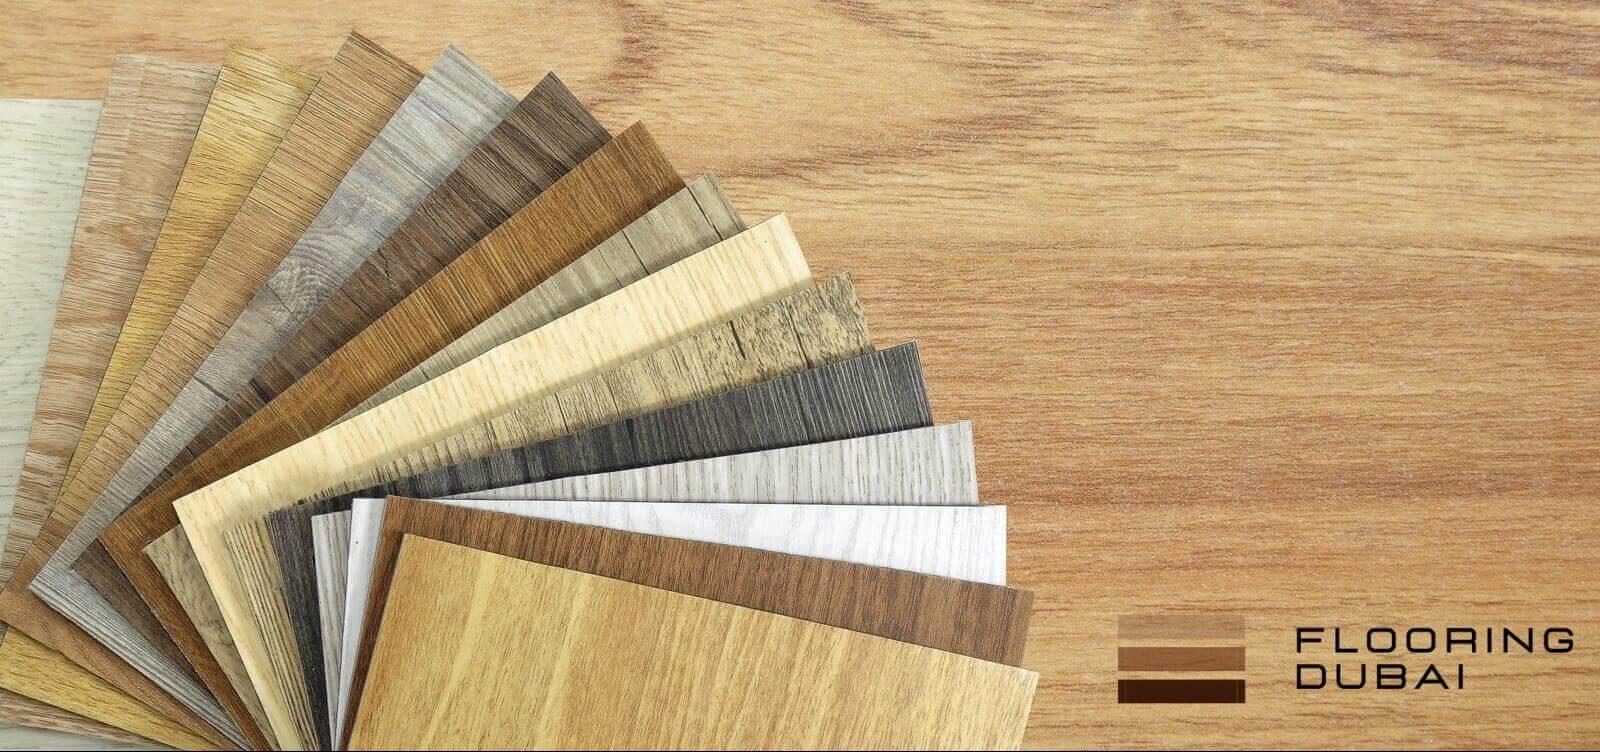 Flooring Dubai Slide1